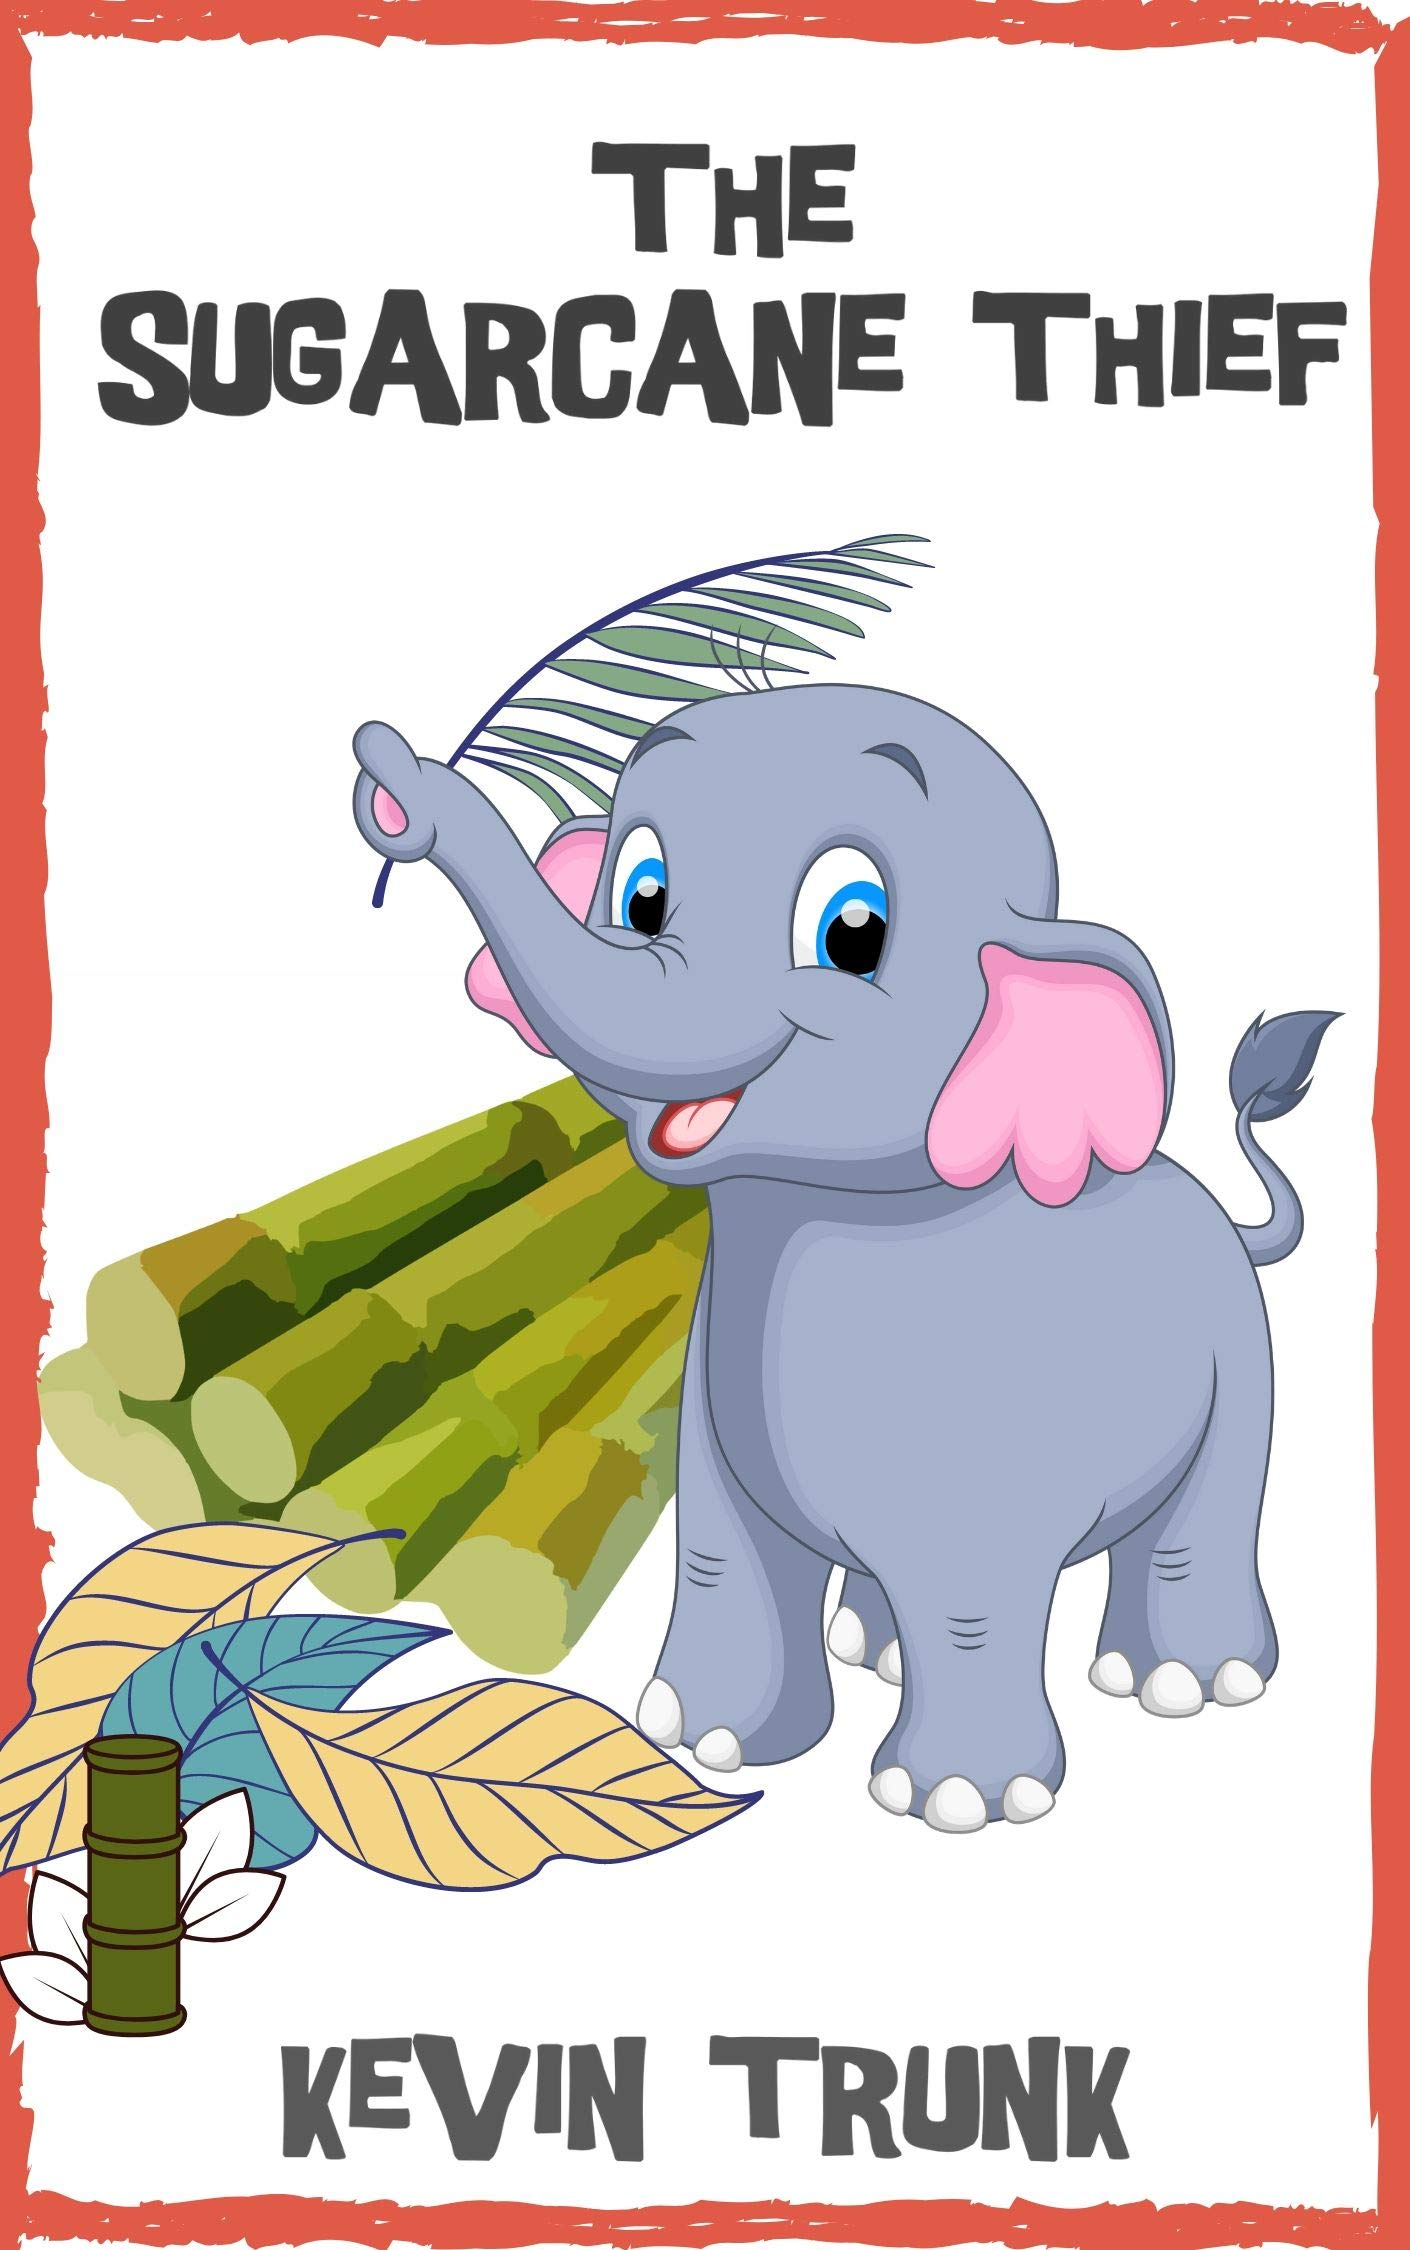 The Sugarcane Thief